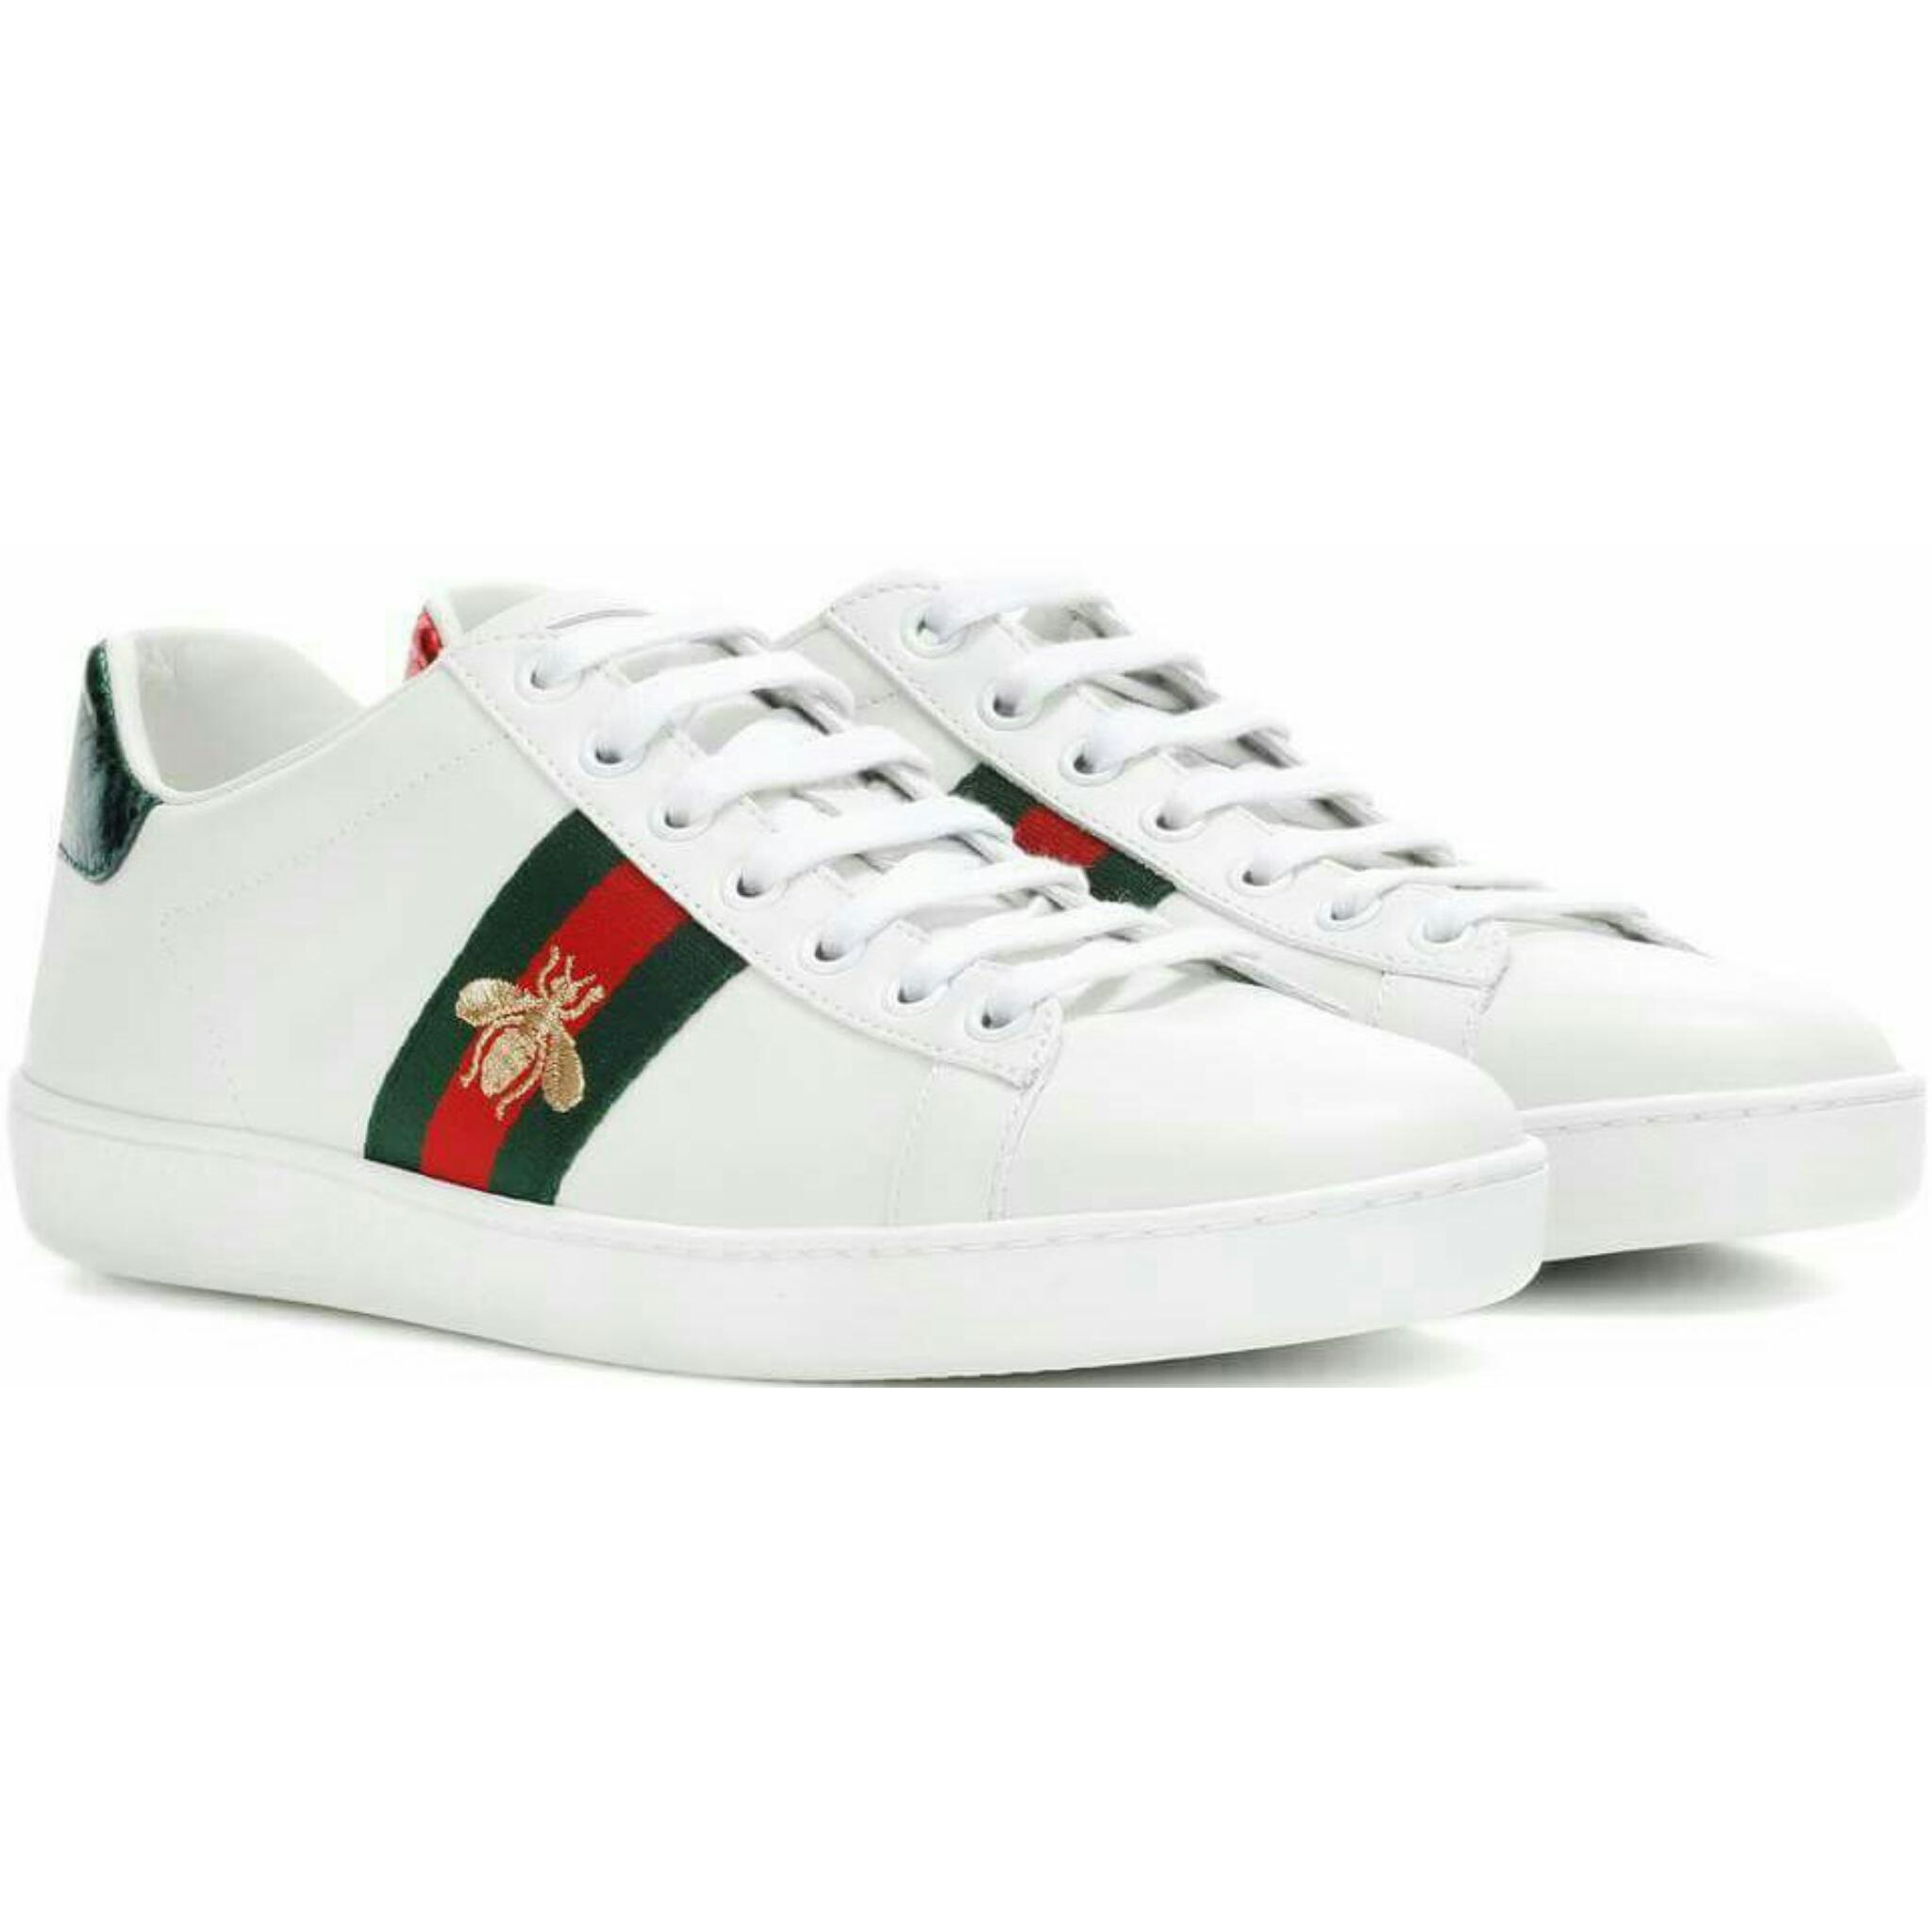 e4846c3d3 Gucci Ace bee Sneaker For Women - Buy Shoes Online In Pakistan